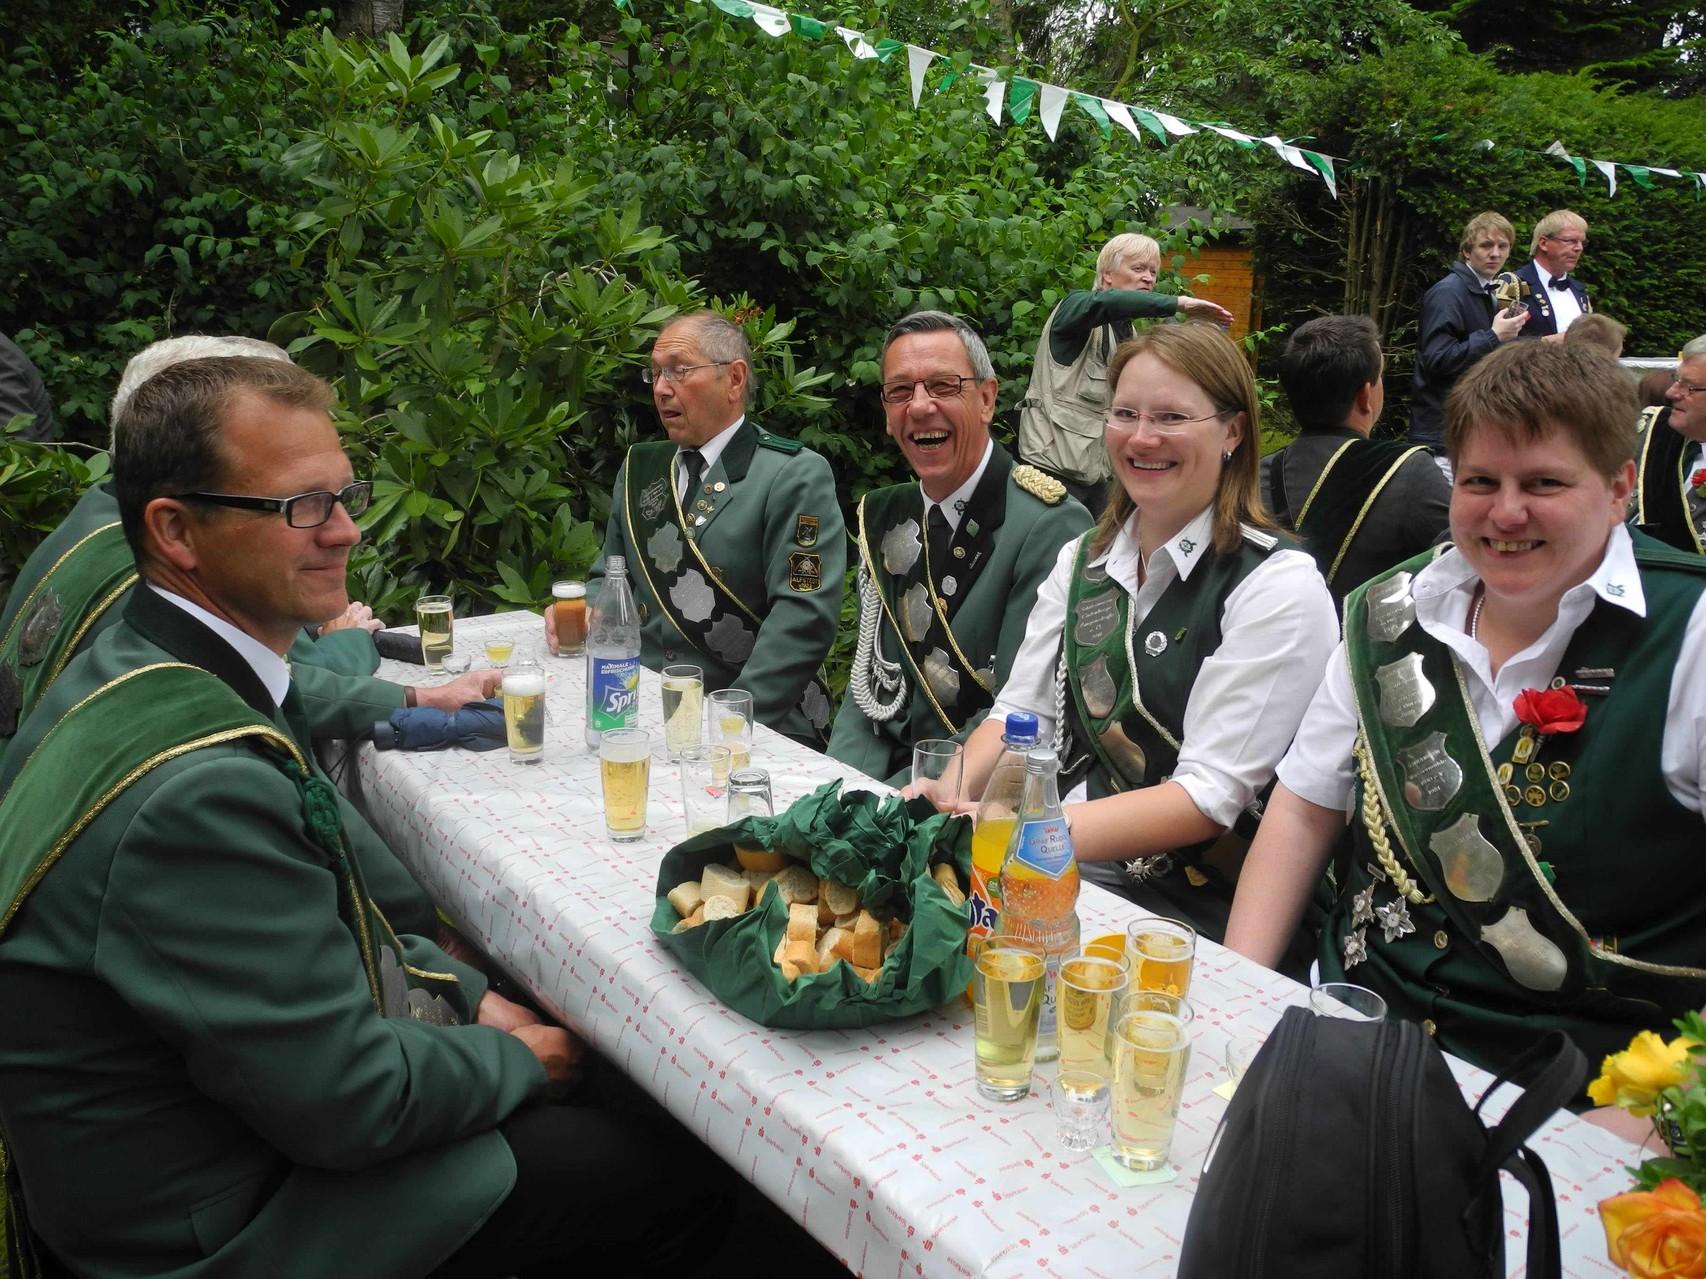 Bannerträger aus Hechthausen im Garten beim Königsbier